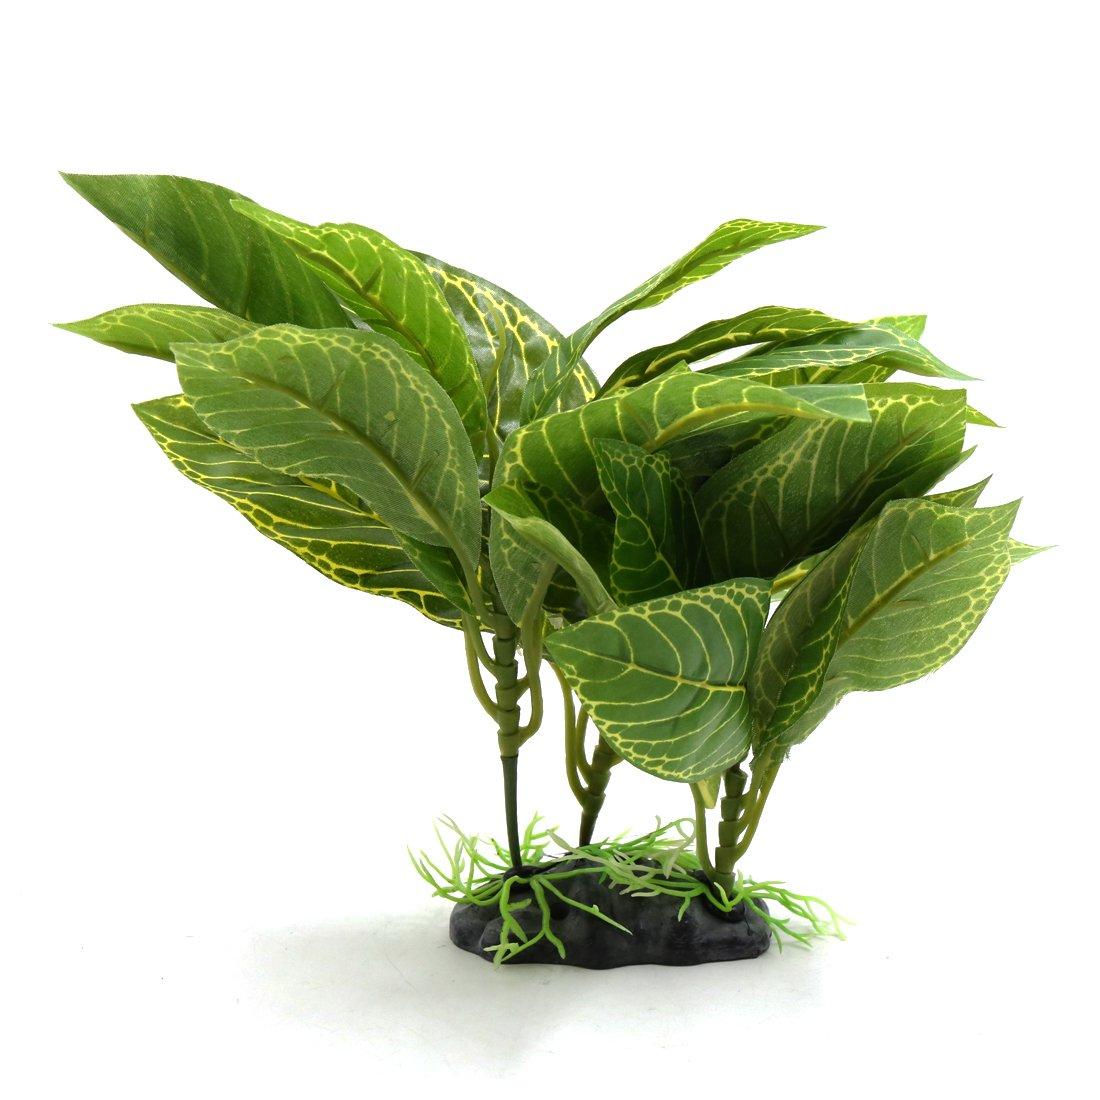 uxcell Green Plastic Terrarium Lifelike Plant Decor Ornament for Reptiles and Amphibians a17062800ux0839